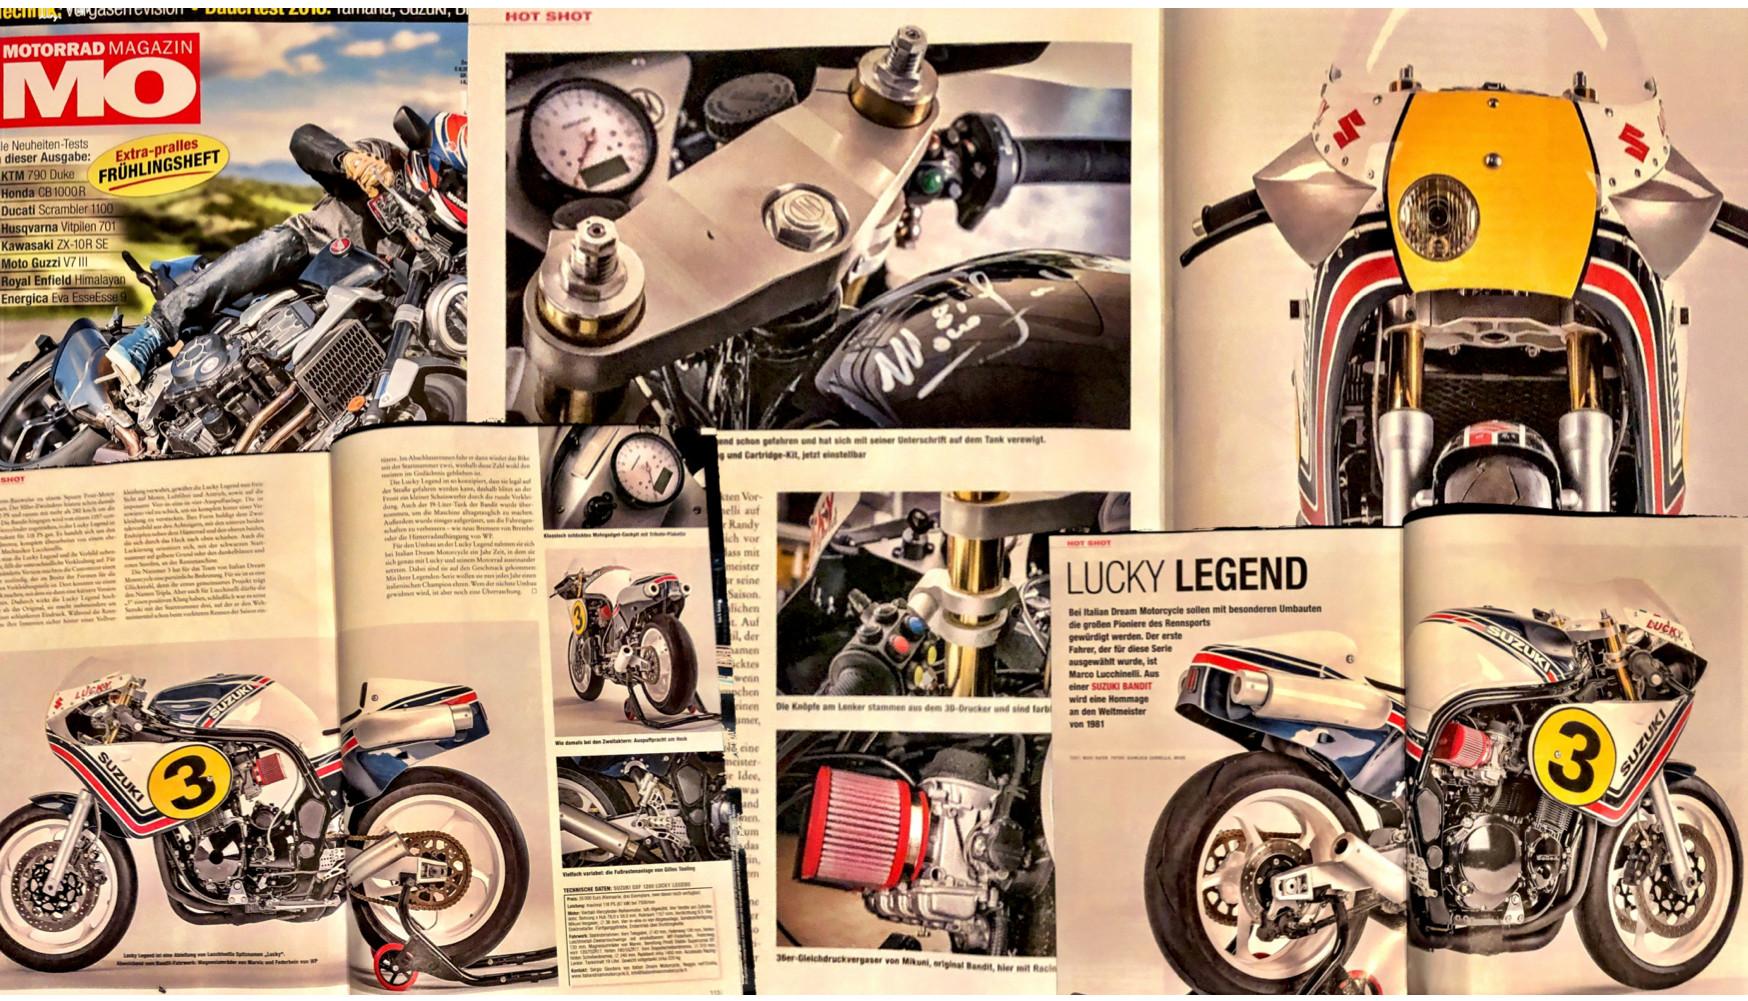 MO MOTORRAD LUCKY LEGEND ITALIAN DREAM M